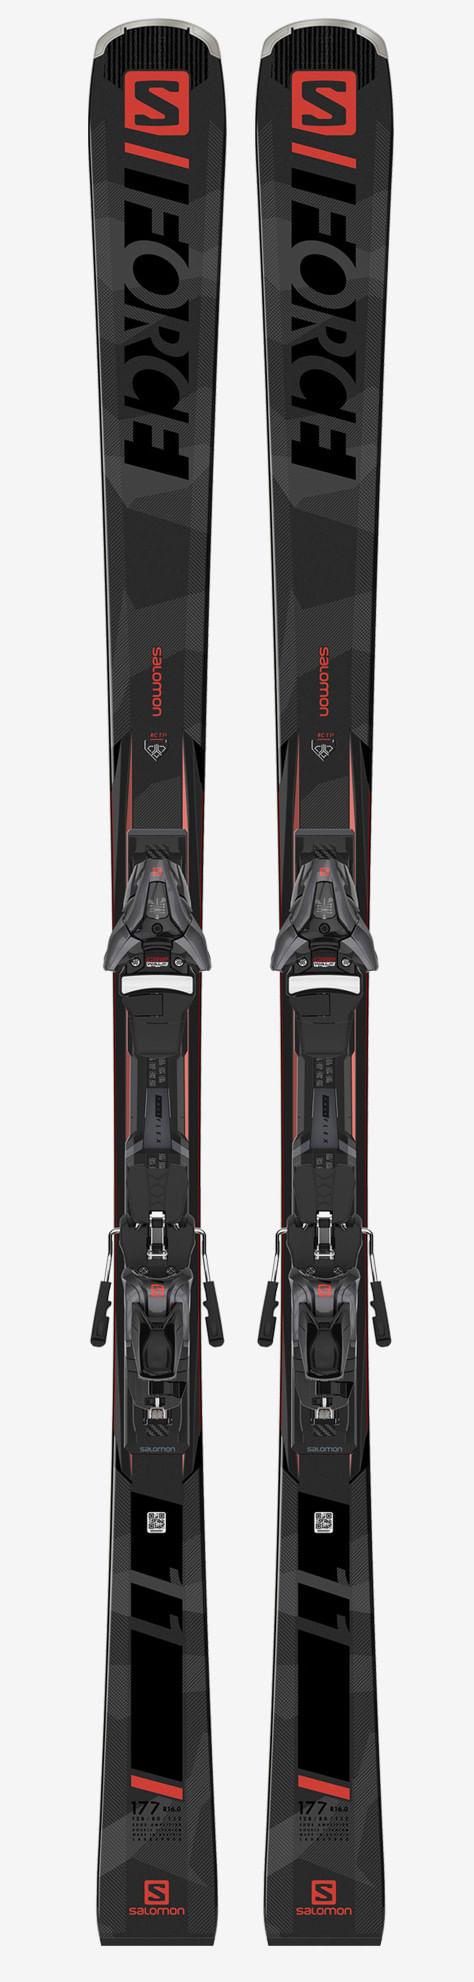 Salomon-S-Force-11-Skis-With-Z12-GW-Bindings-2021